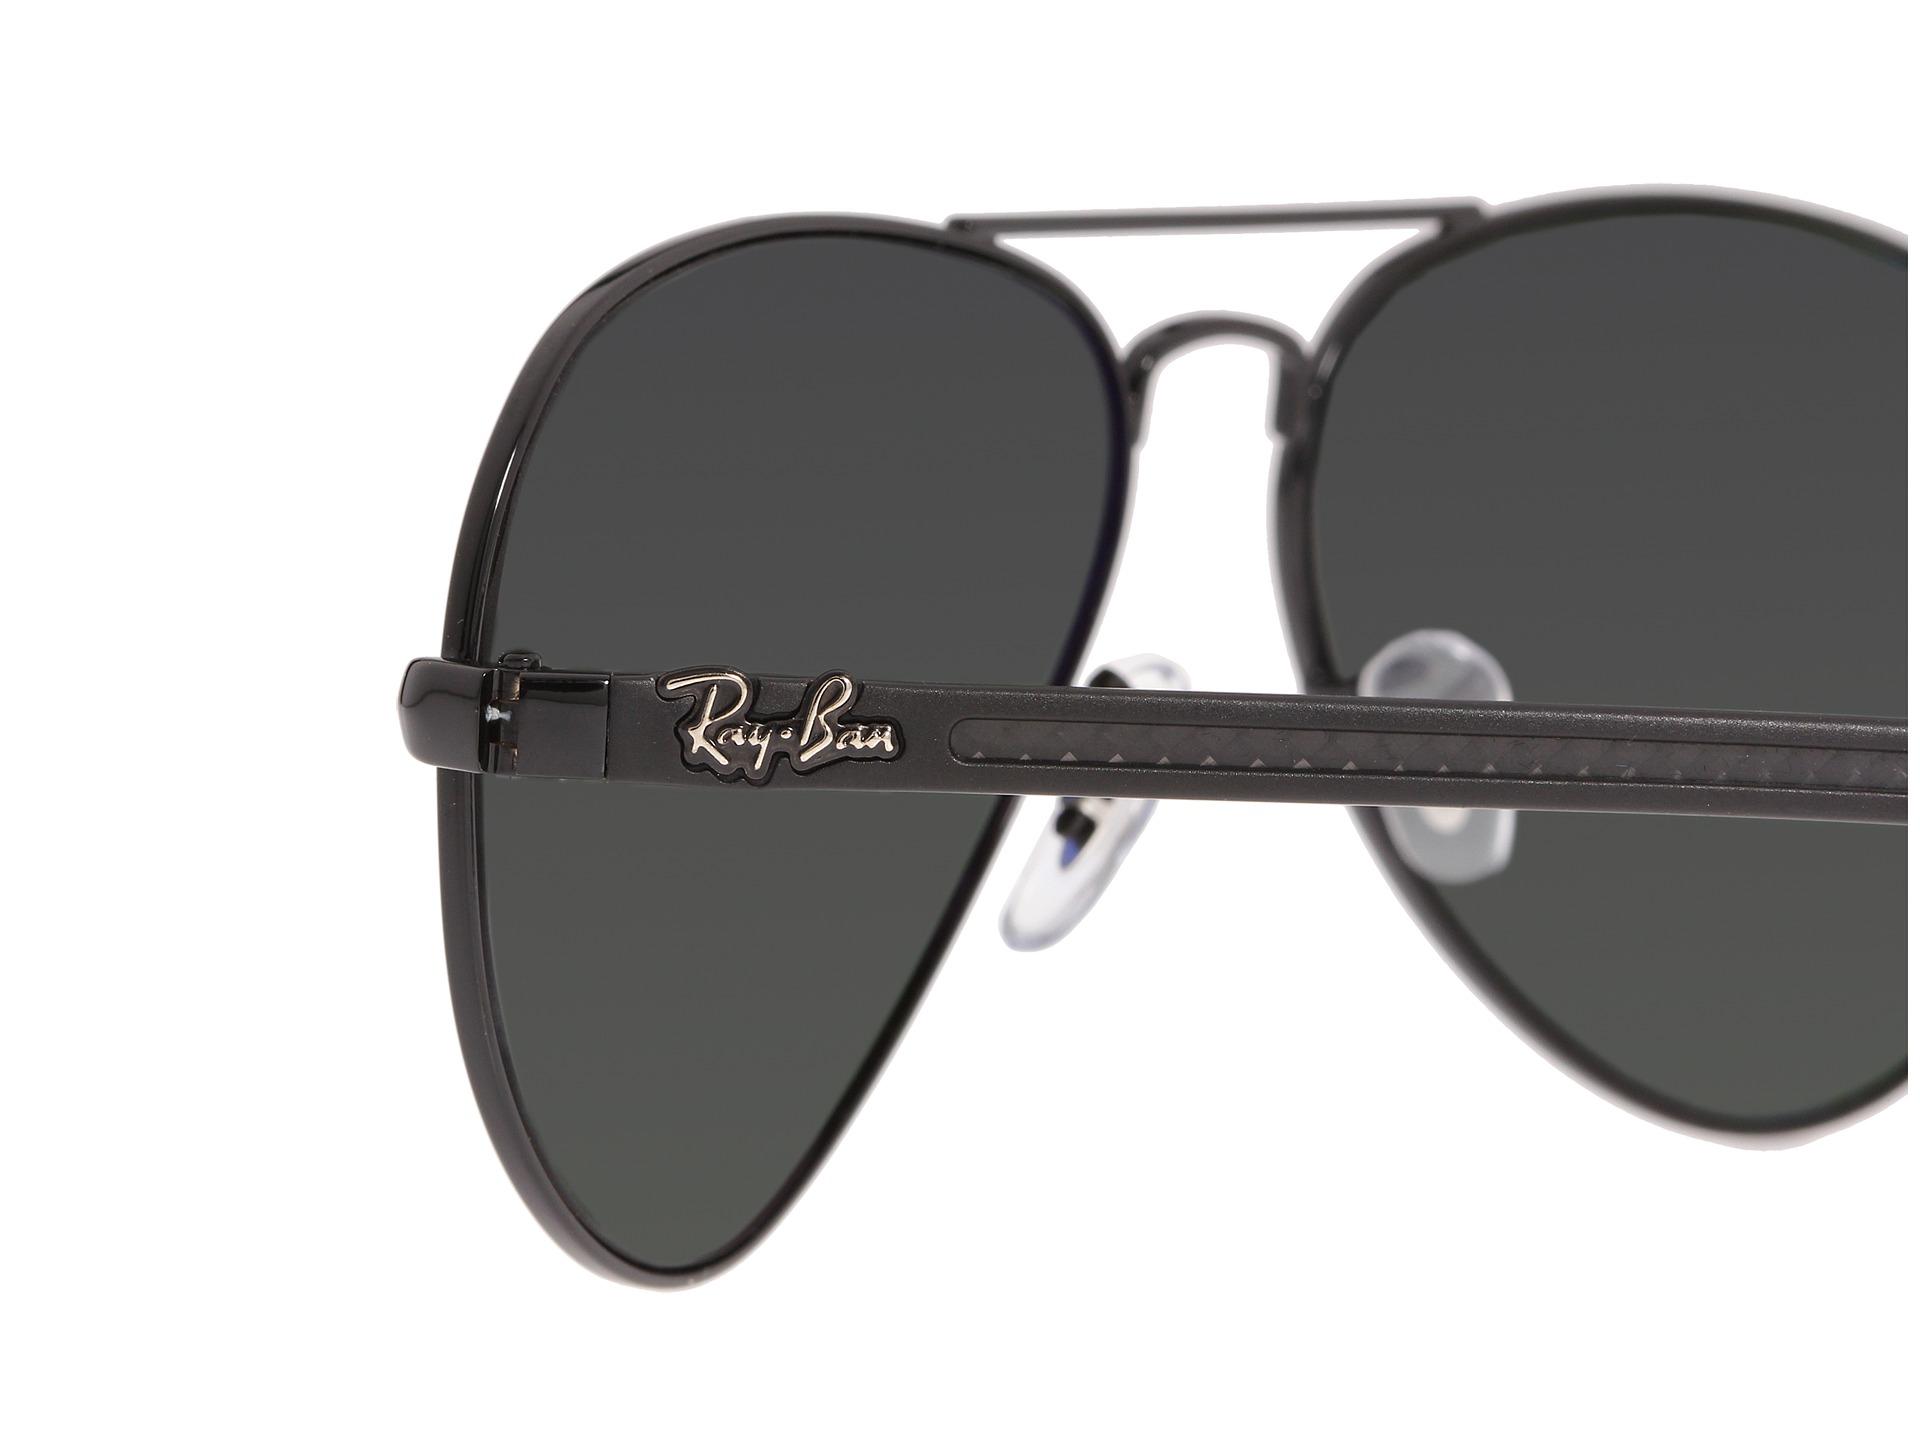 ray ban 8307 review